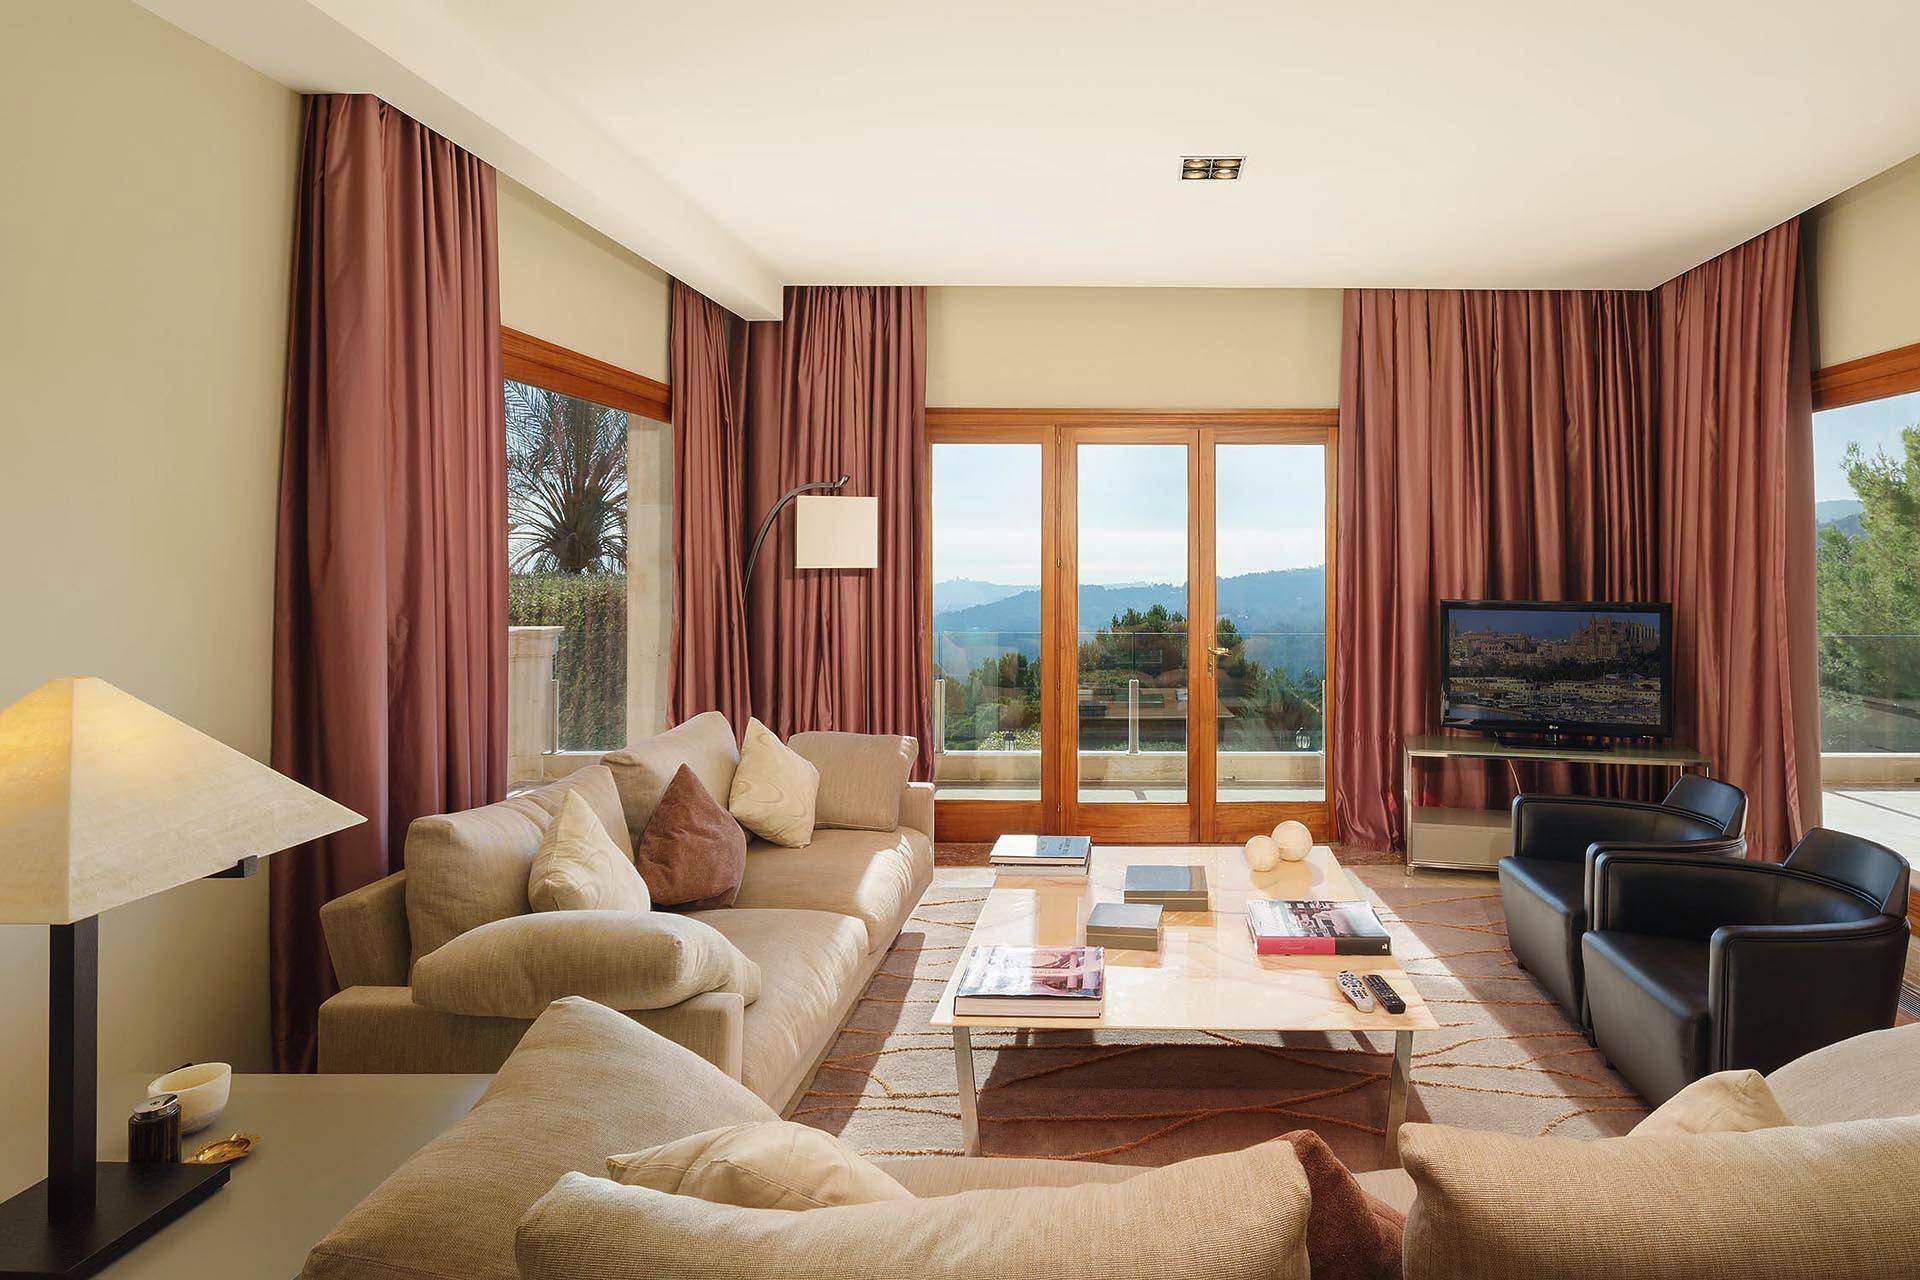 01-280 großzügige Villa nahe Palma de Mallorca Bild 21